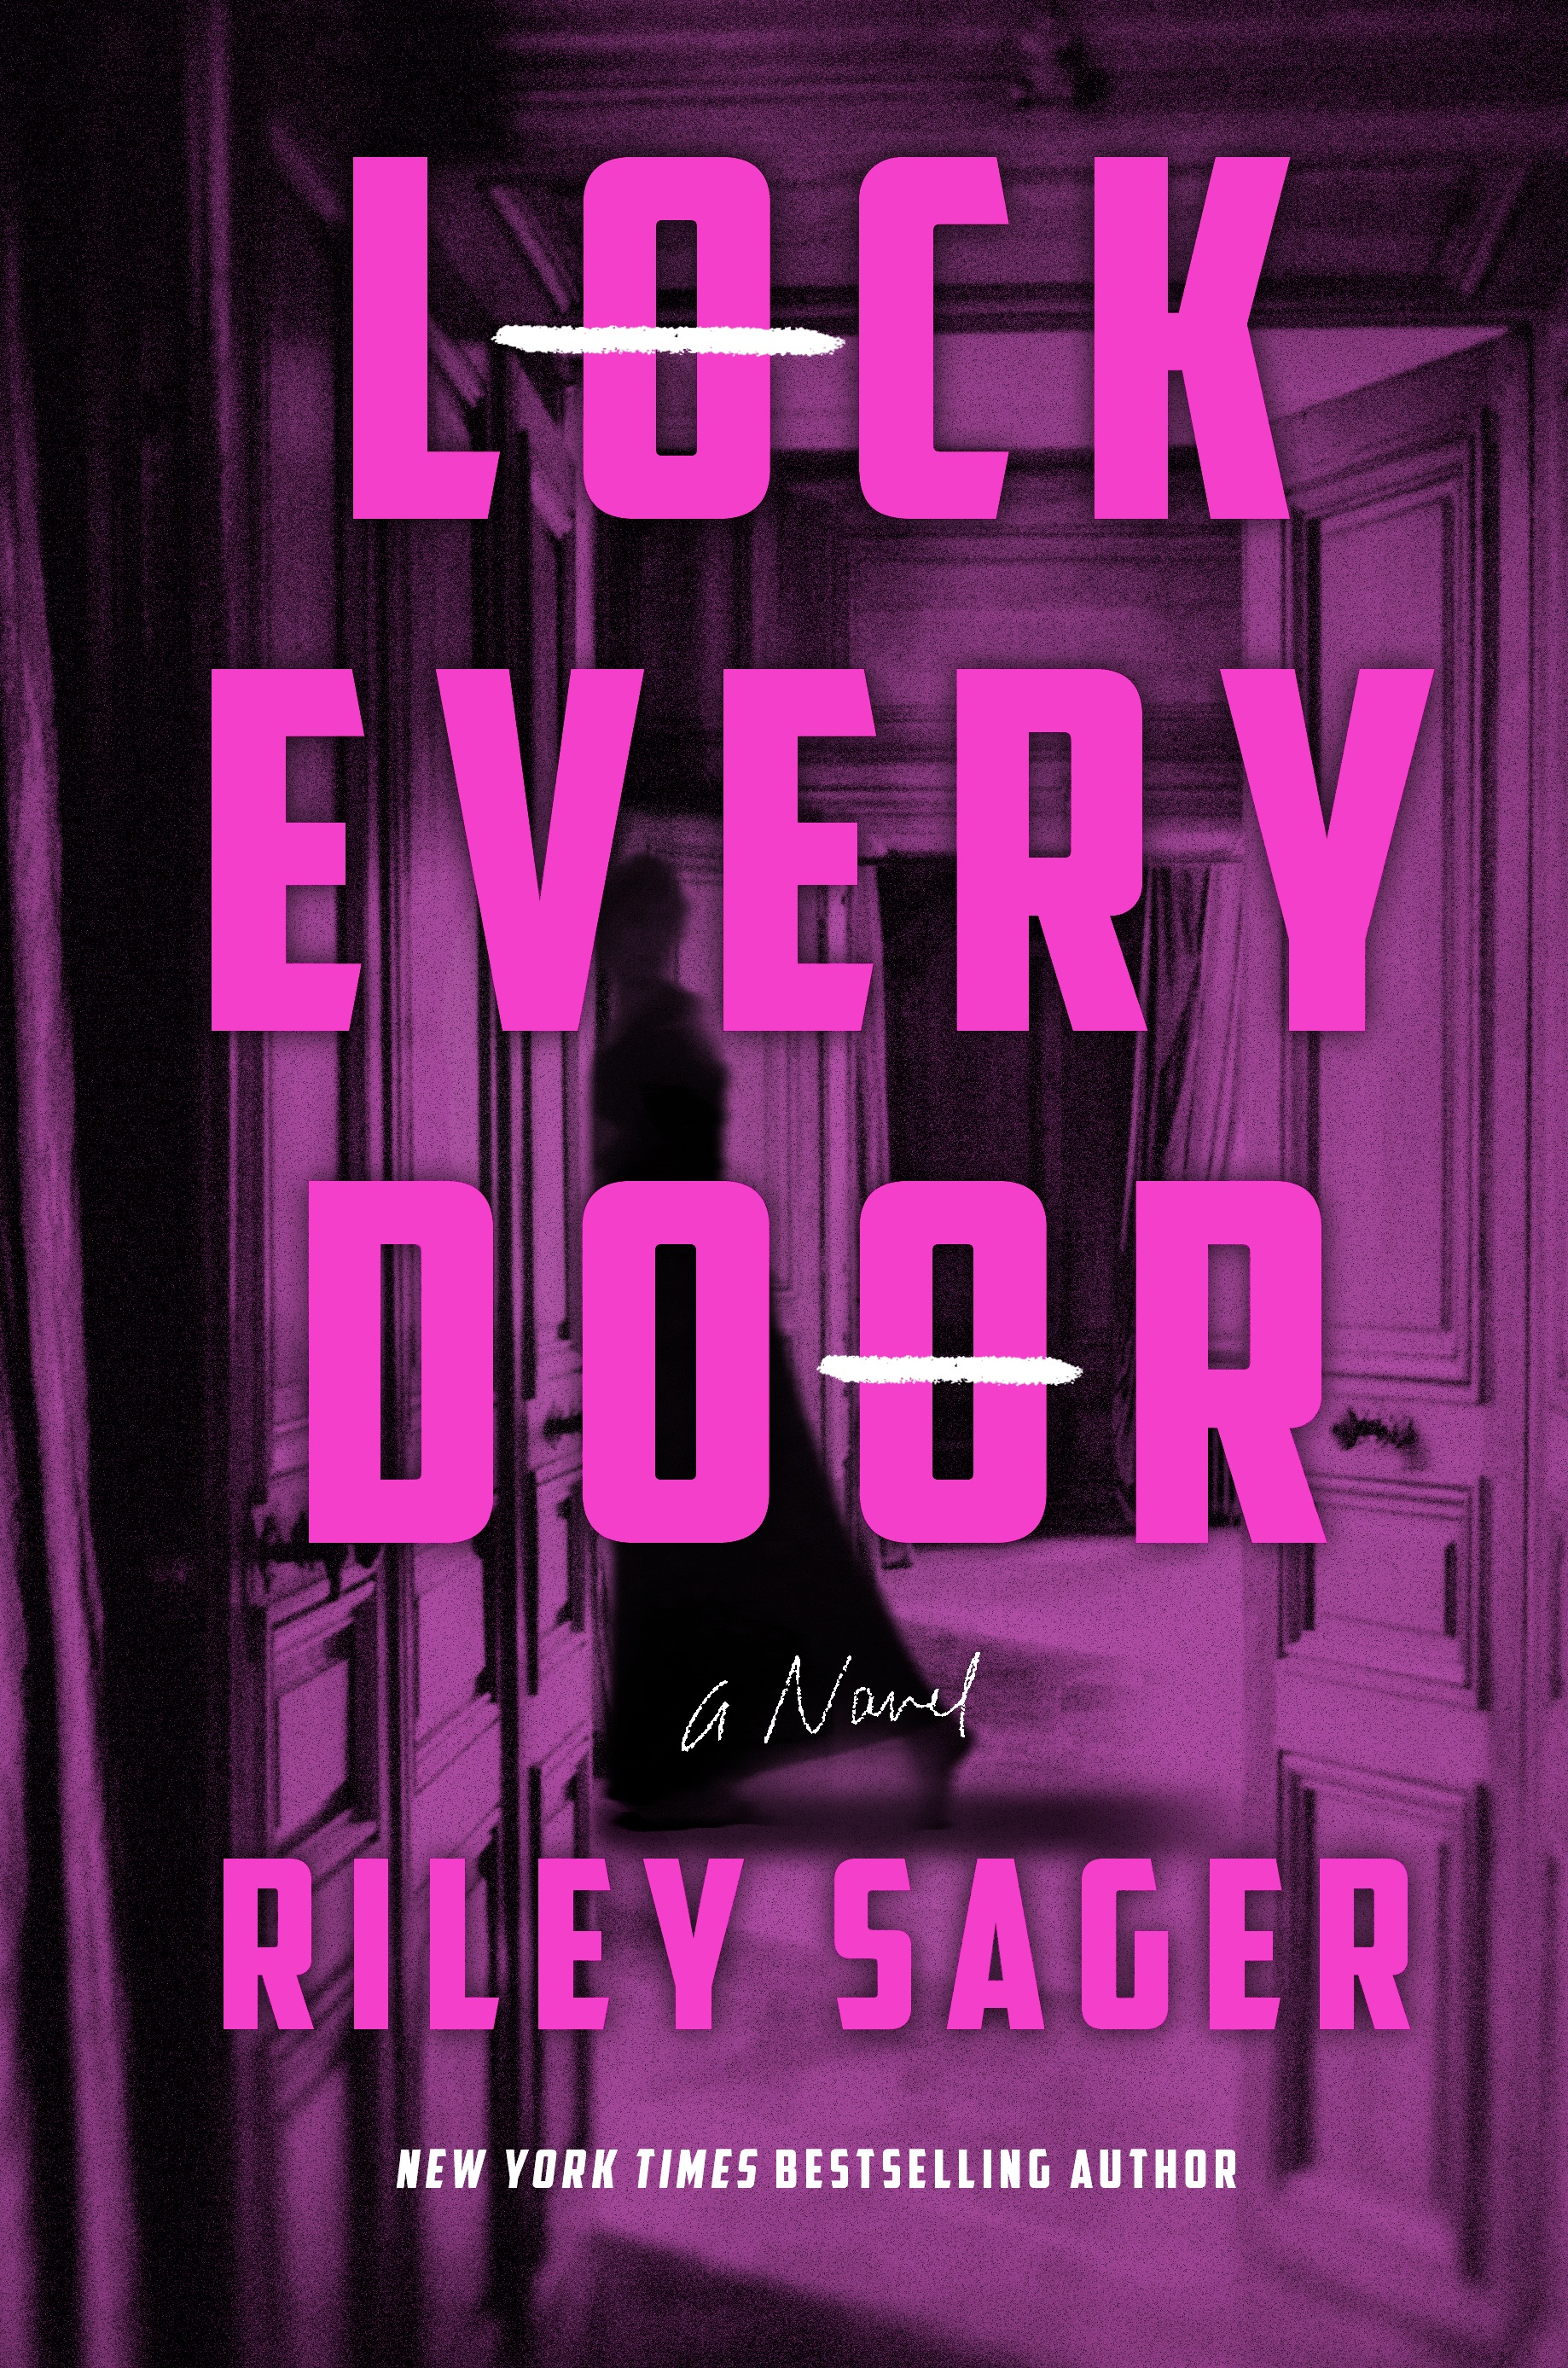 Lock Every Door by Riley Sager.jpg